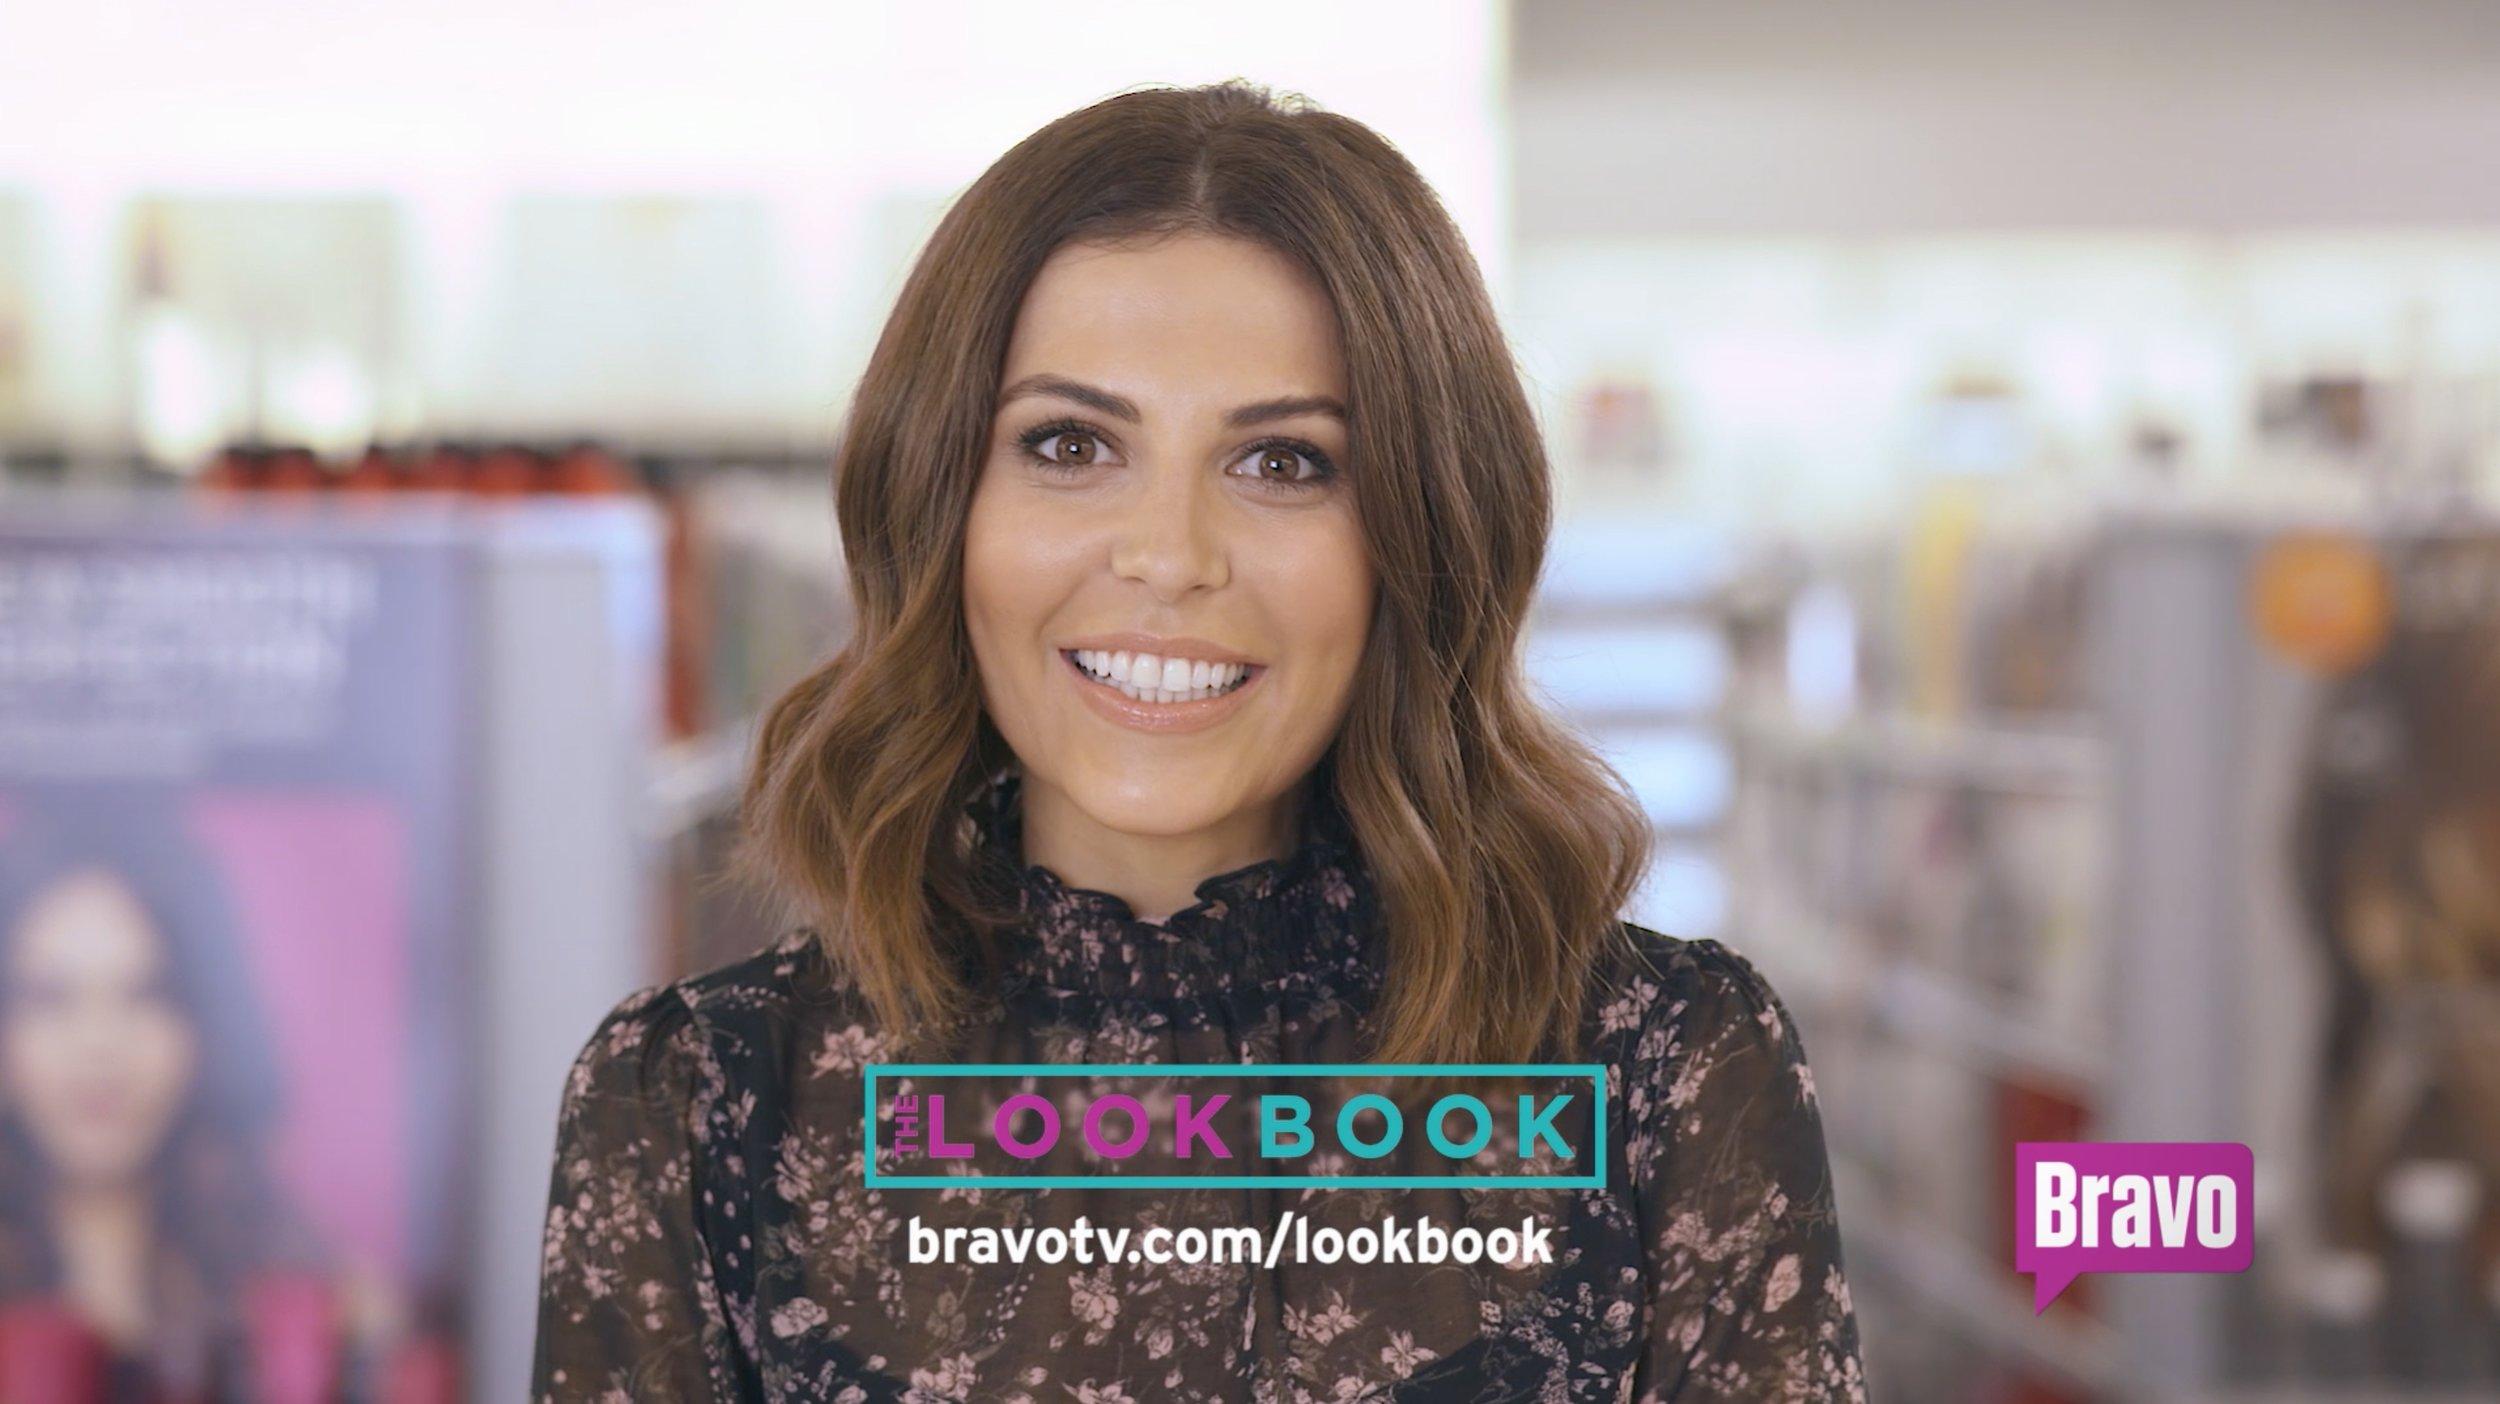 Bravo - The Lookbook 203.jpg